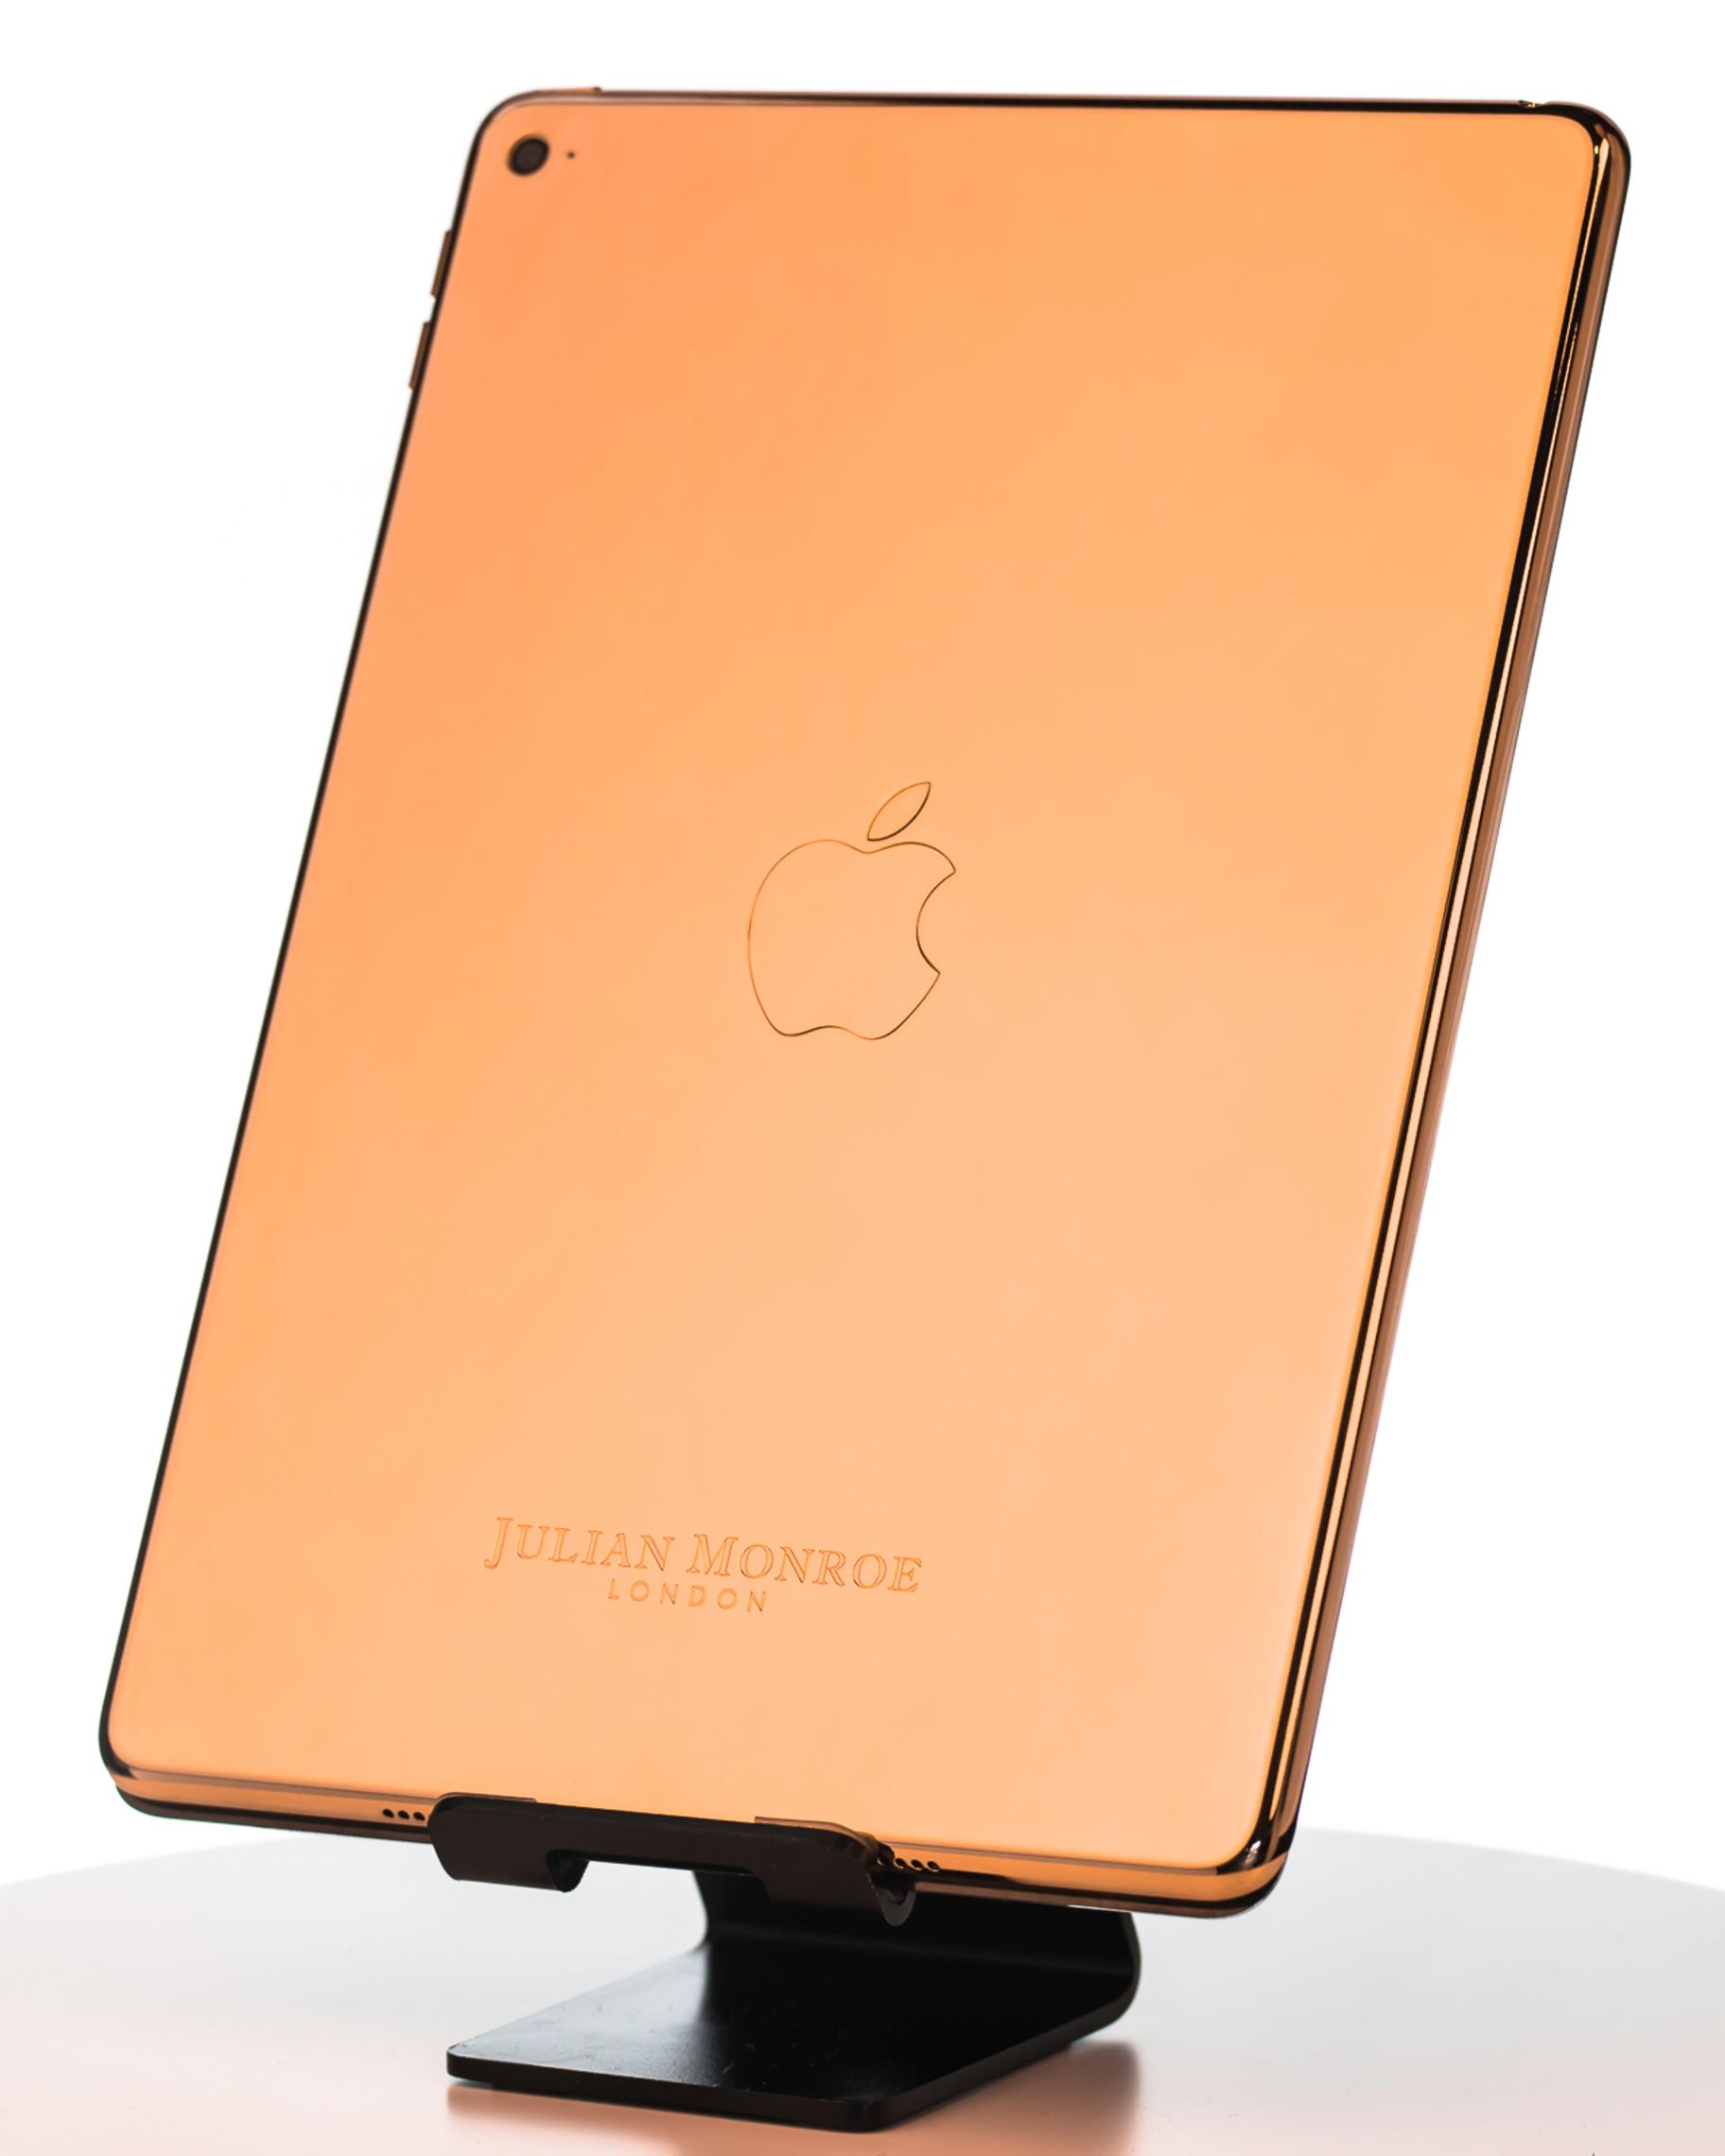 18ct Rose Gold iPad Air 2 (By Julian Monroe London)